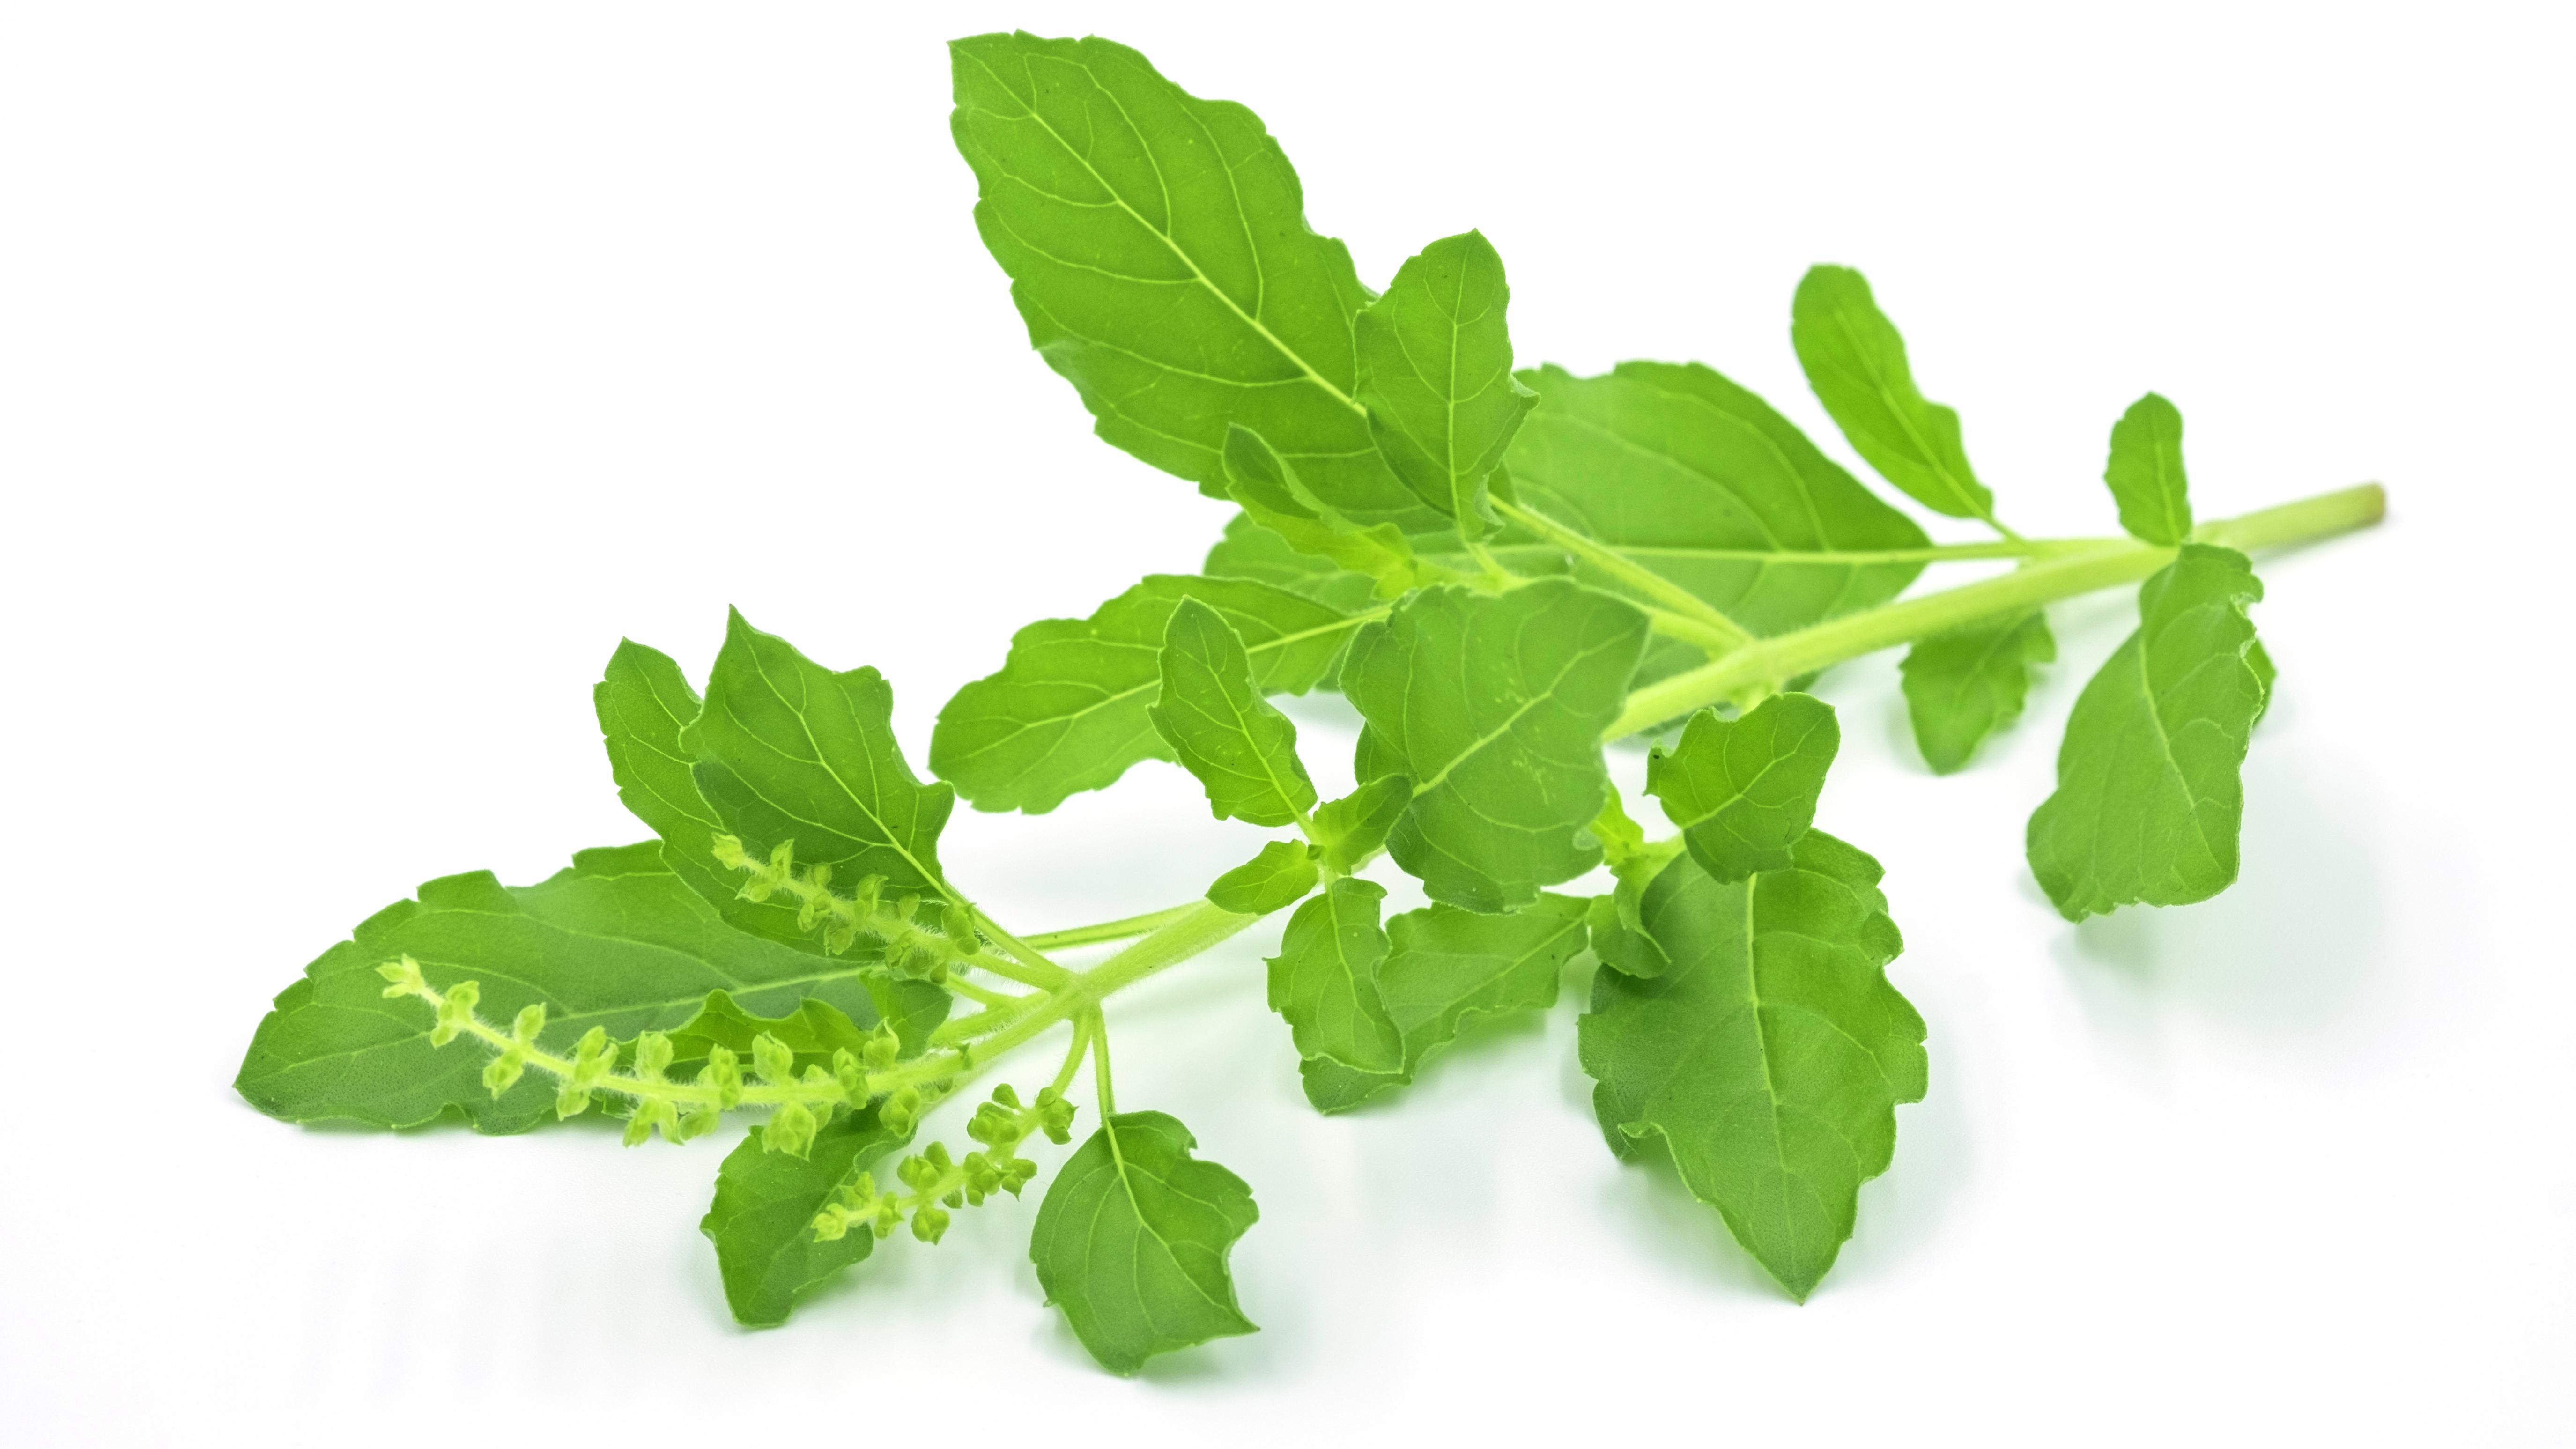 Tulsi, or holy basil leaves